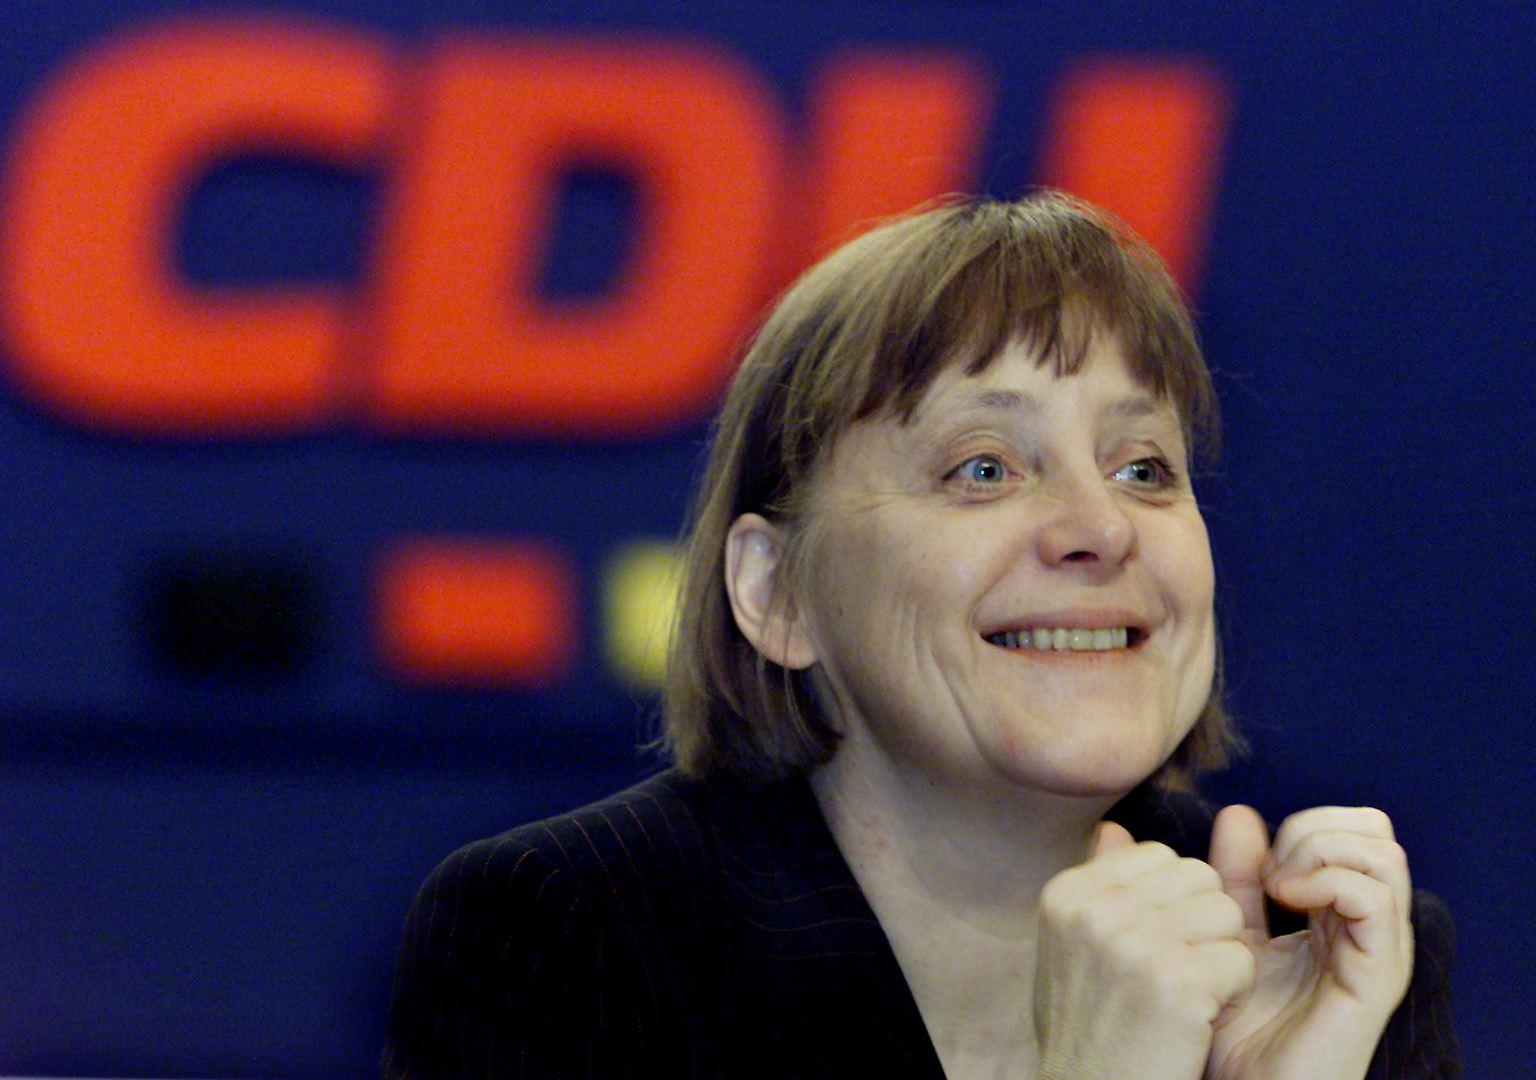 Angela Merkel Chronik Der Veranderung N Tv De